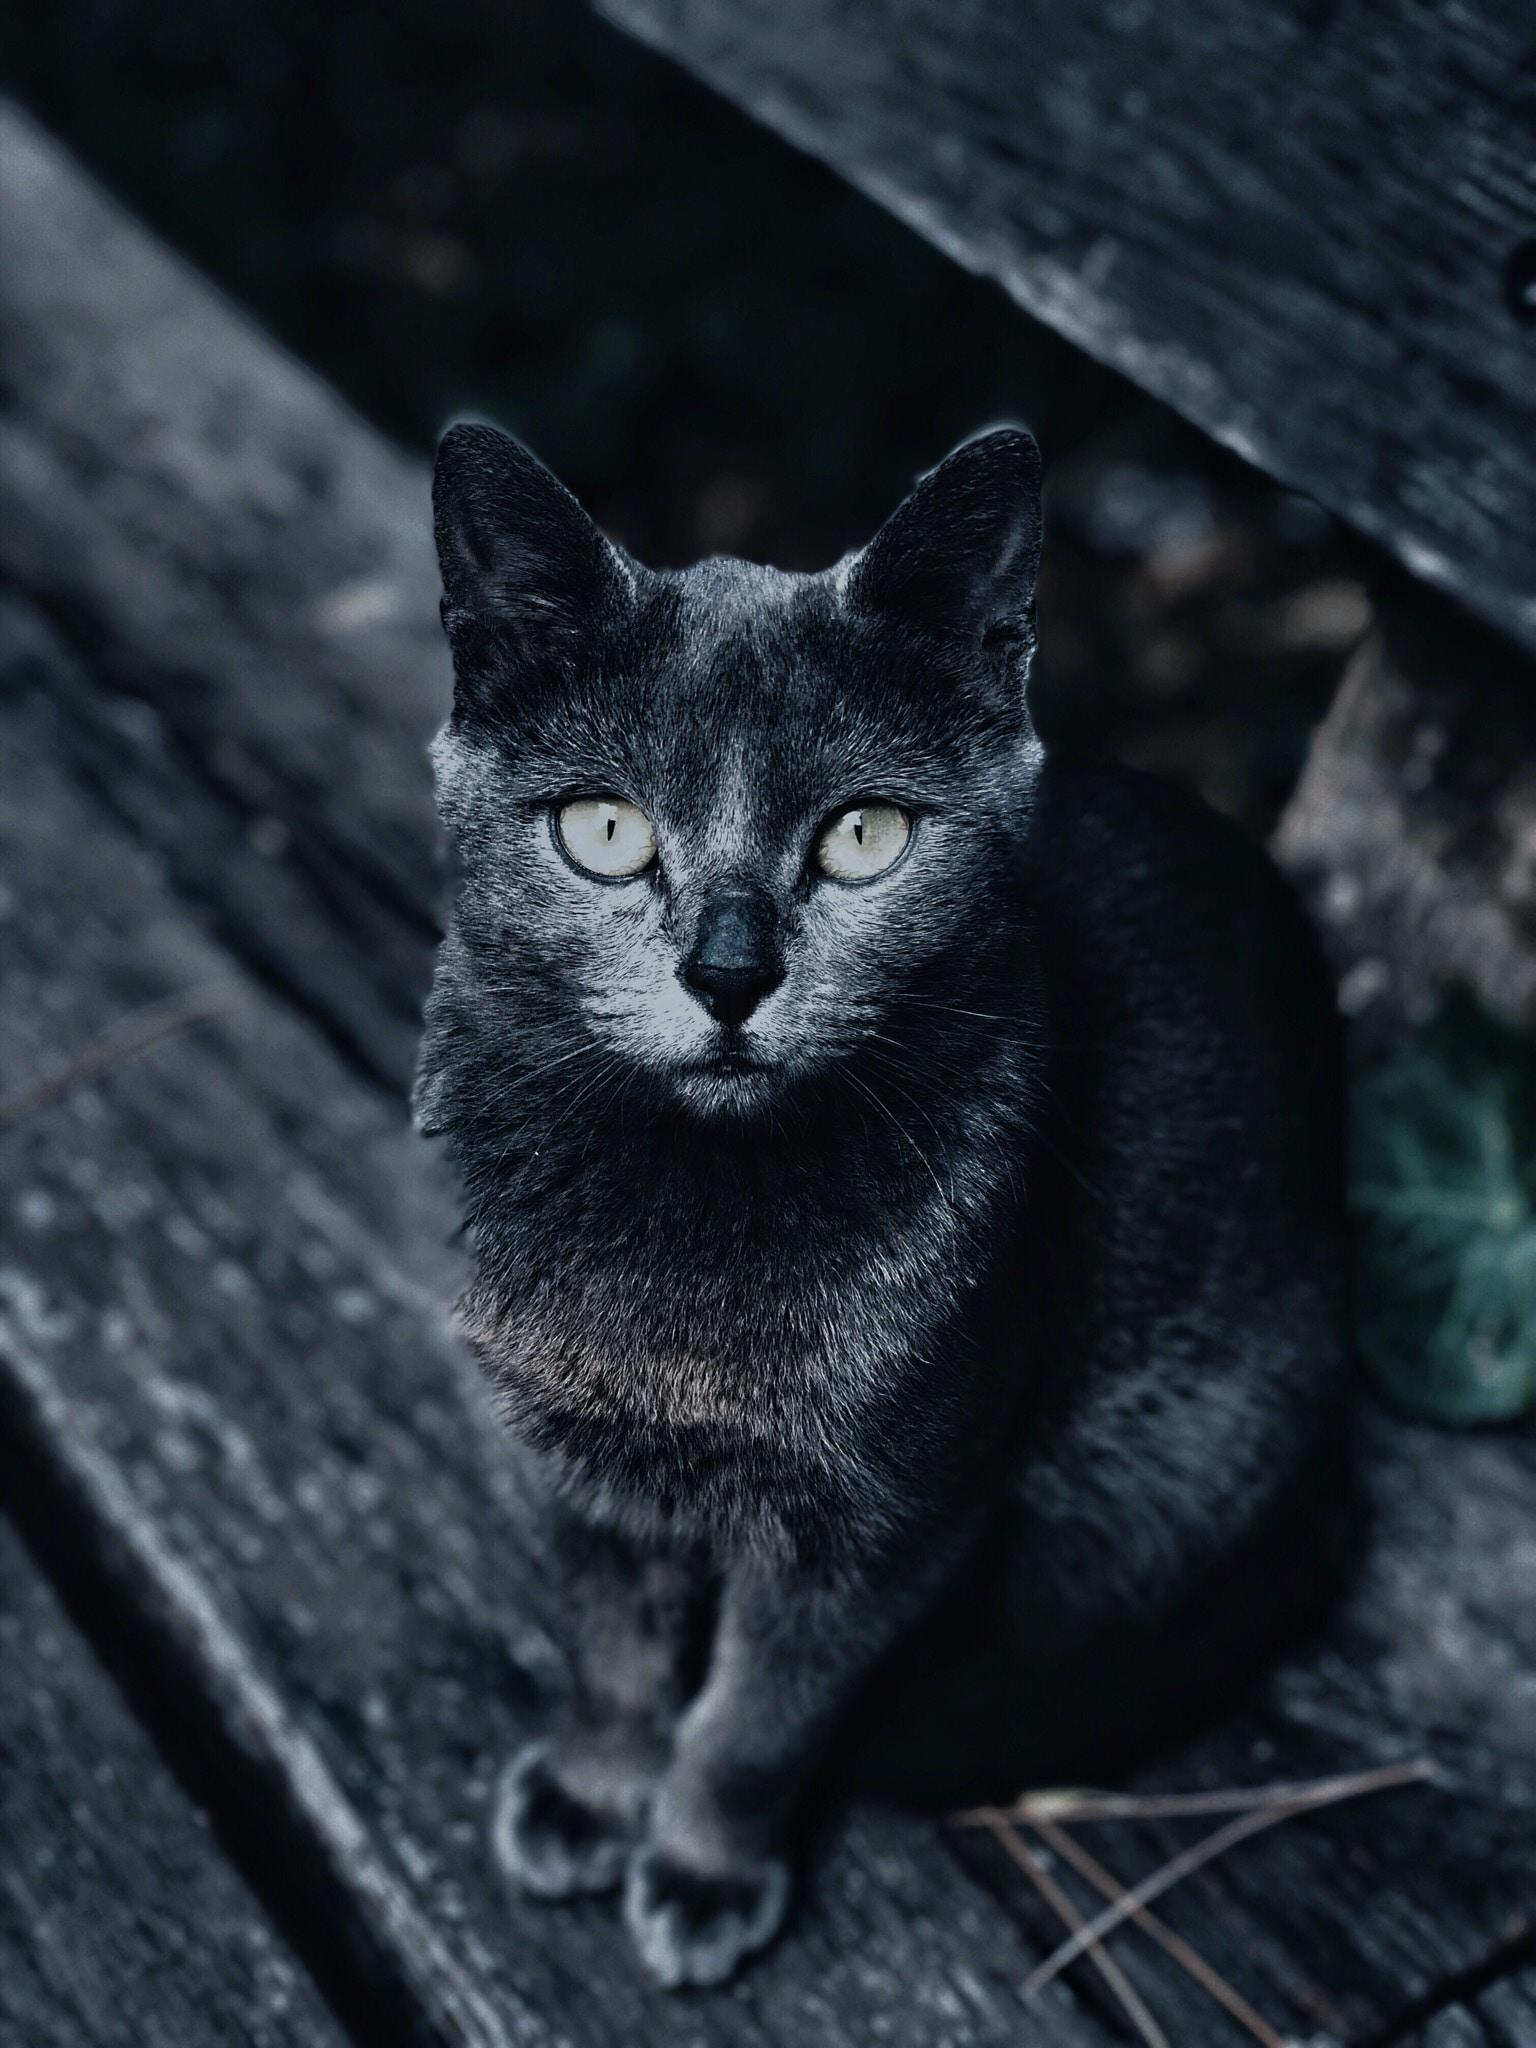 Stray Cat cat stories